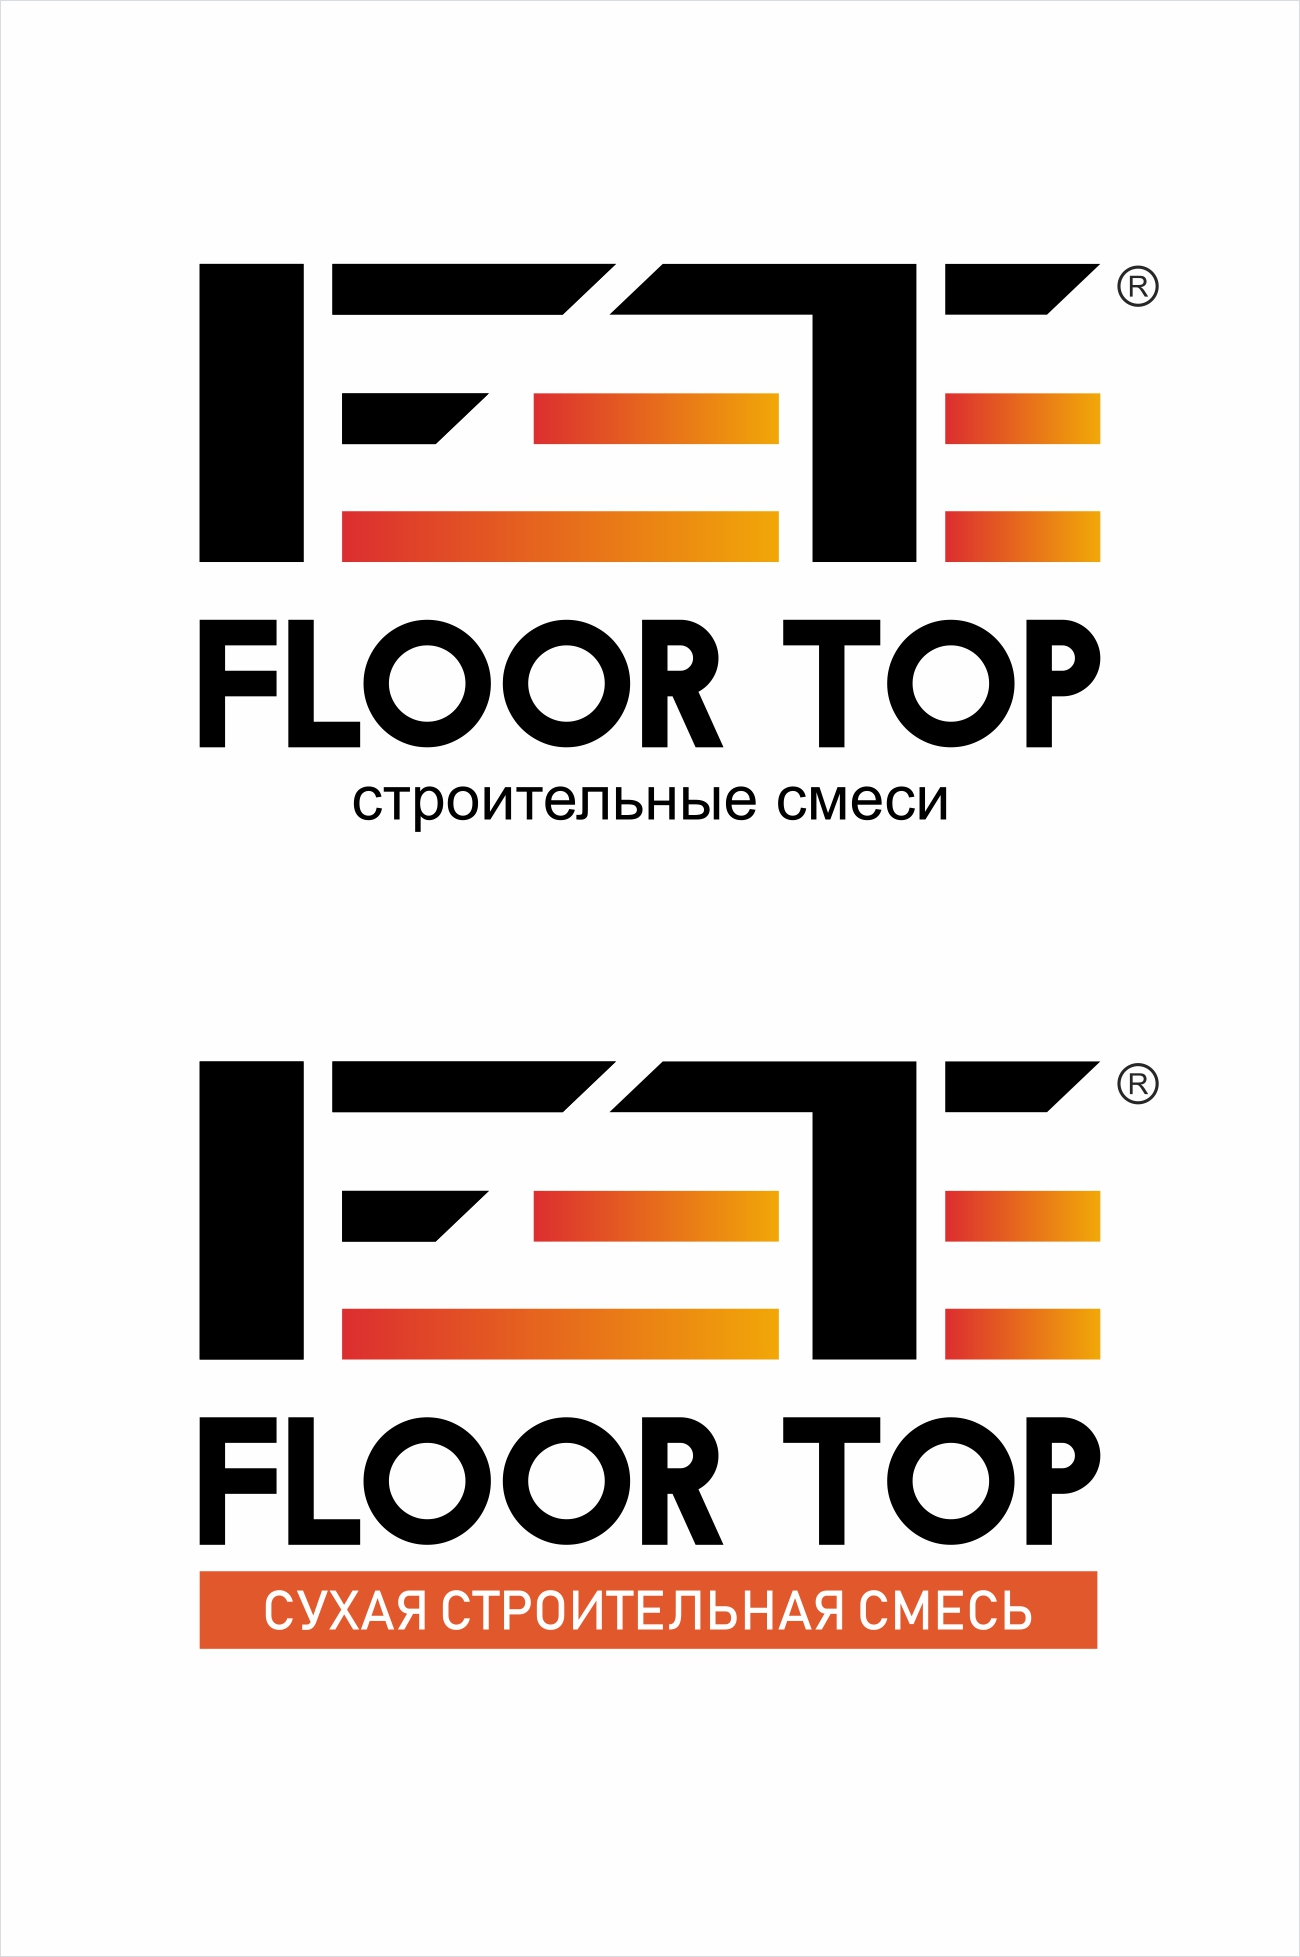 Разработка логотипа и дизайна на упаковку для сухой смеси фото f_4855d27692b7f09f.jpg